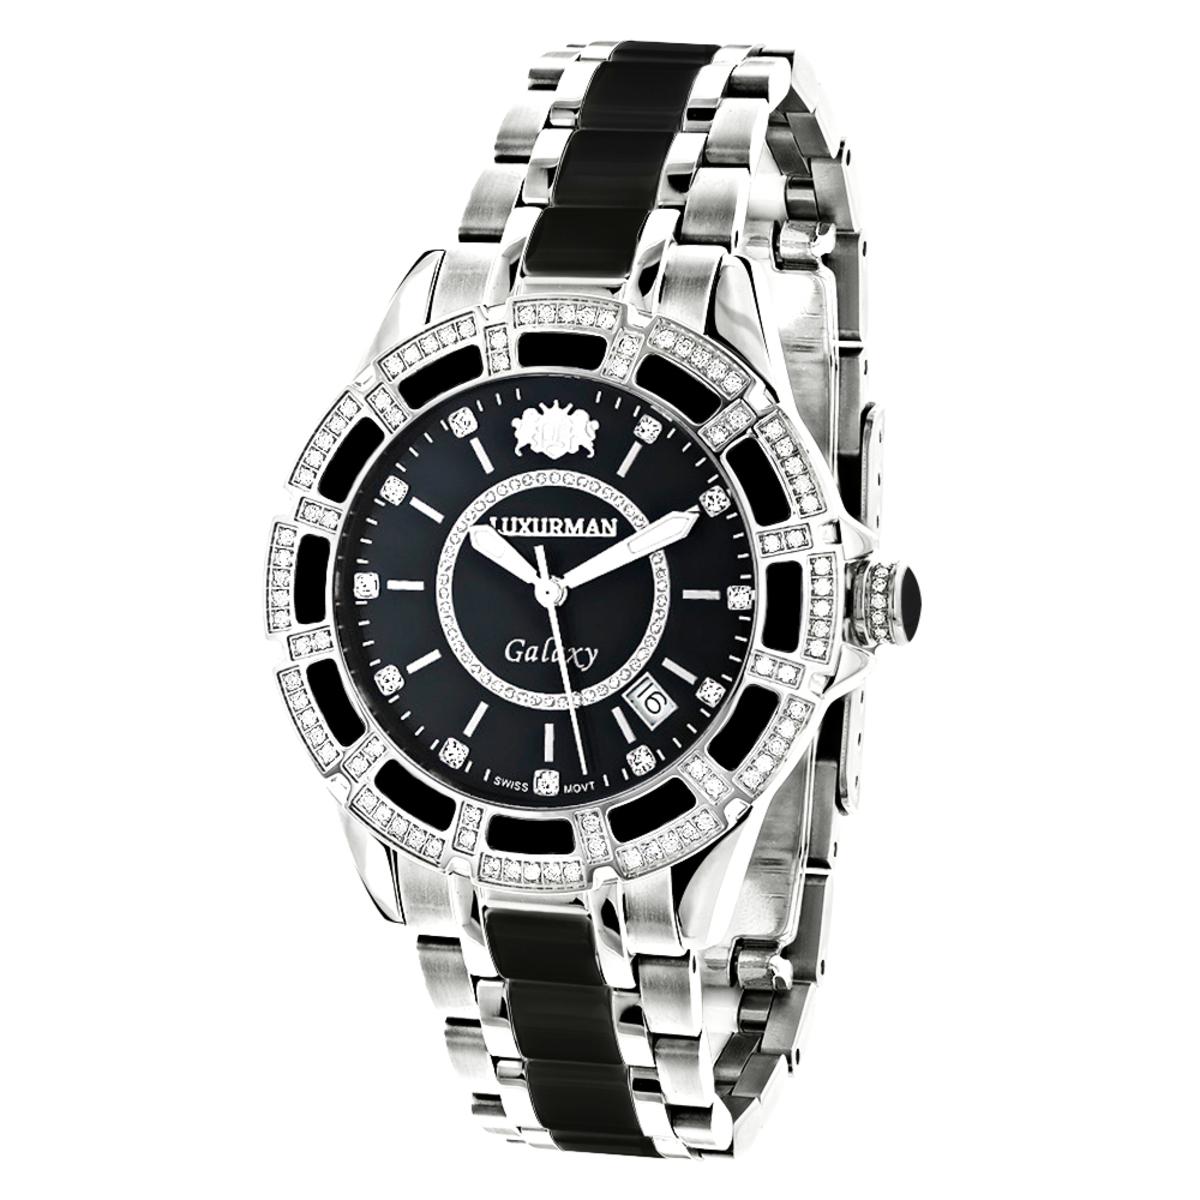 Luxurman Galaxy Midsize Diamond Watch Black Ceramic 1.25ct